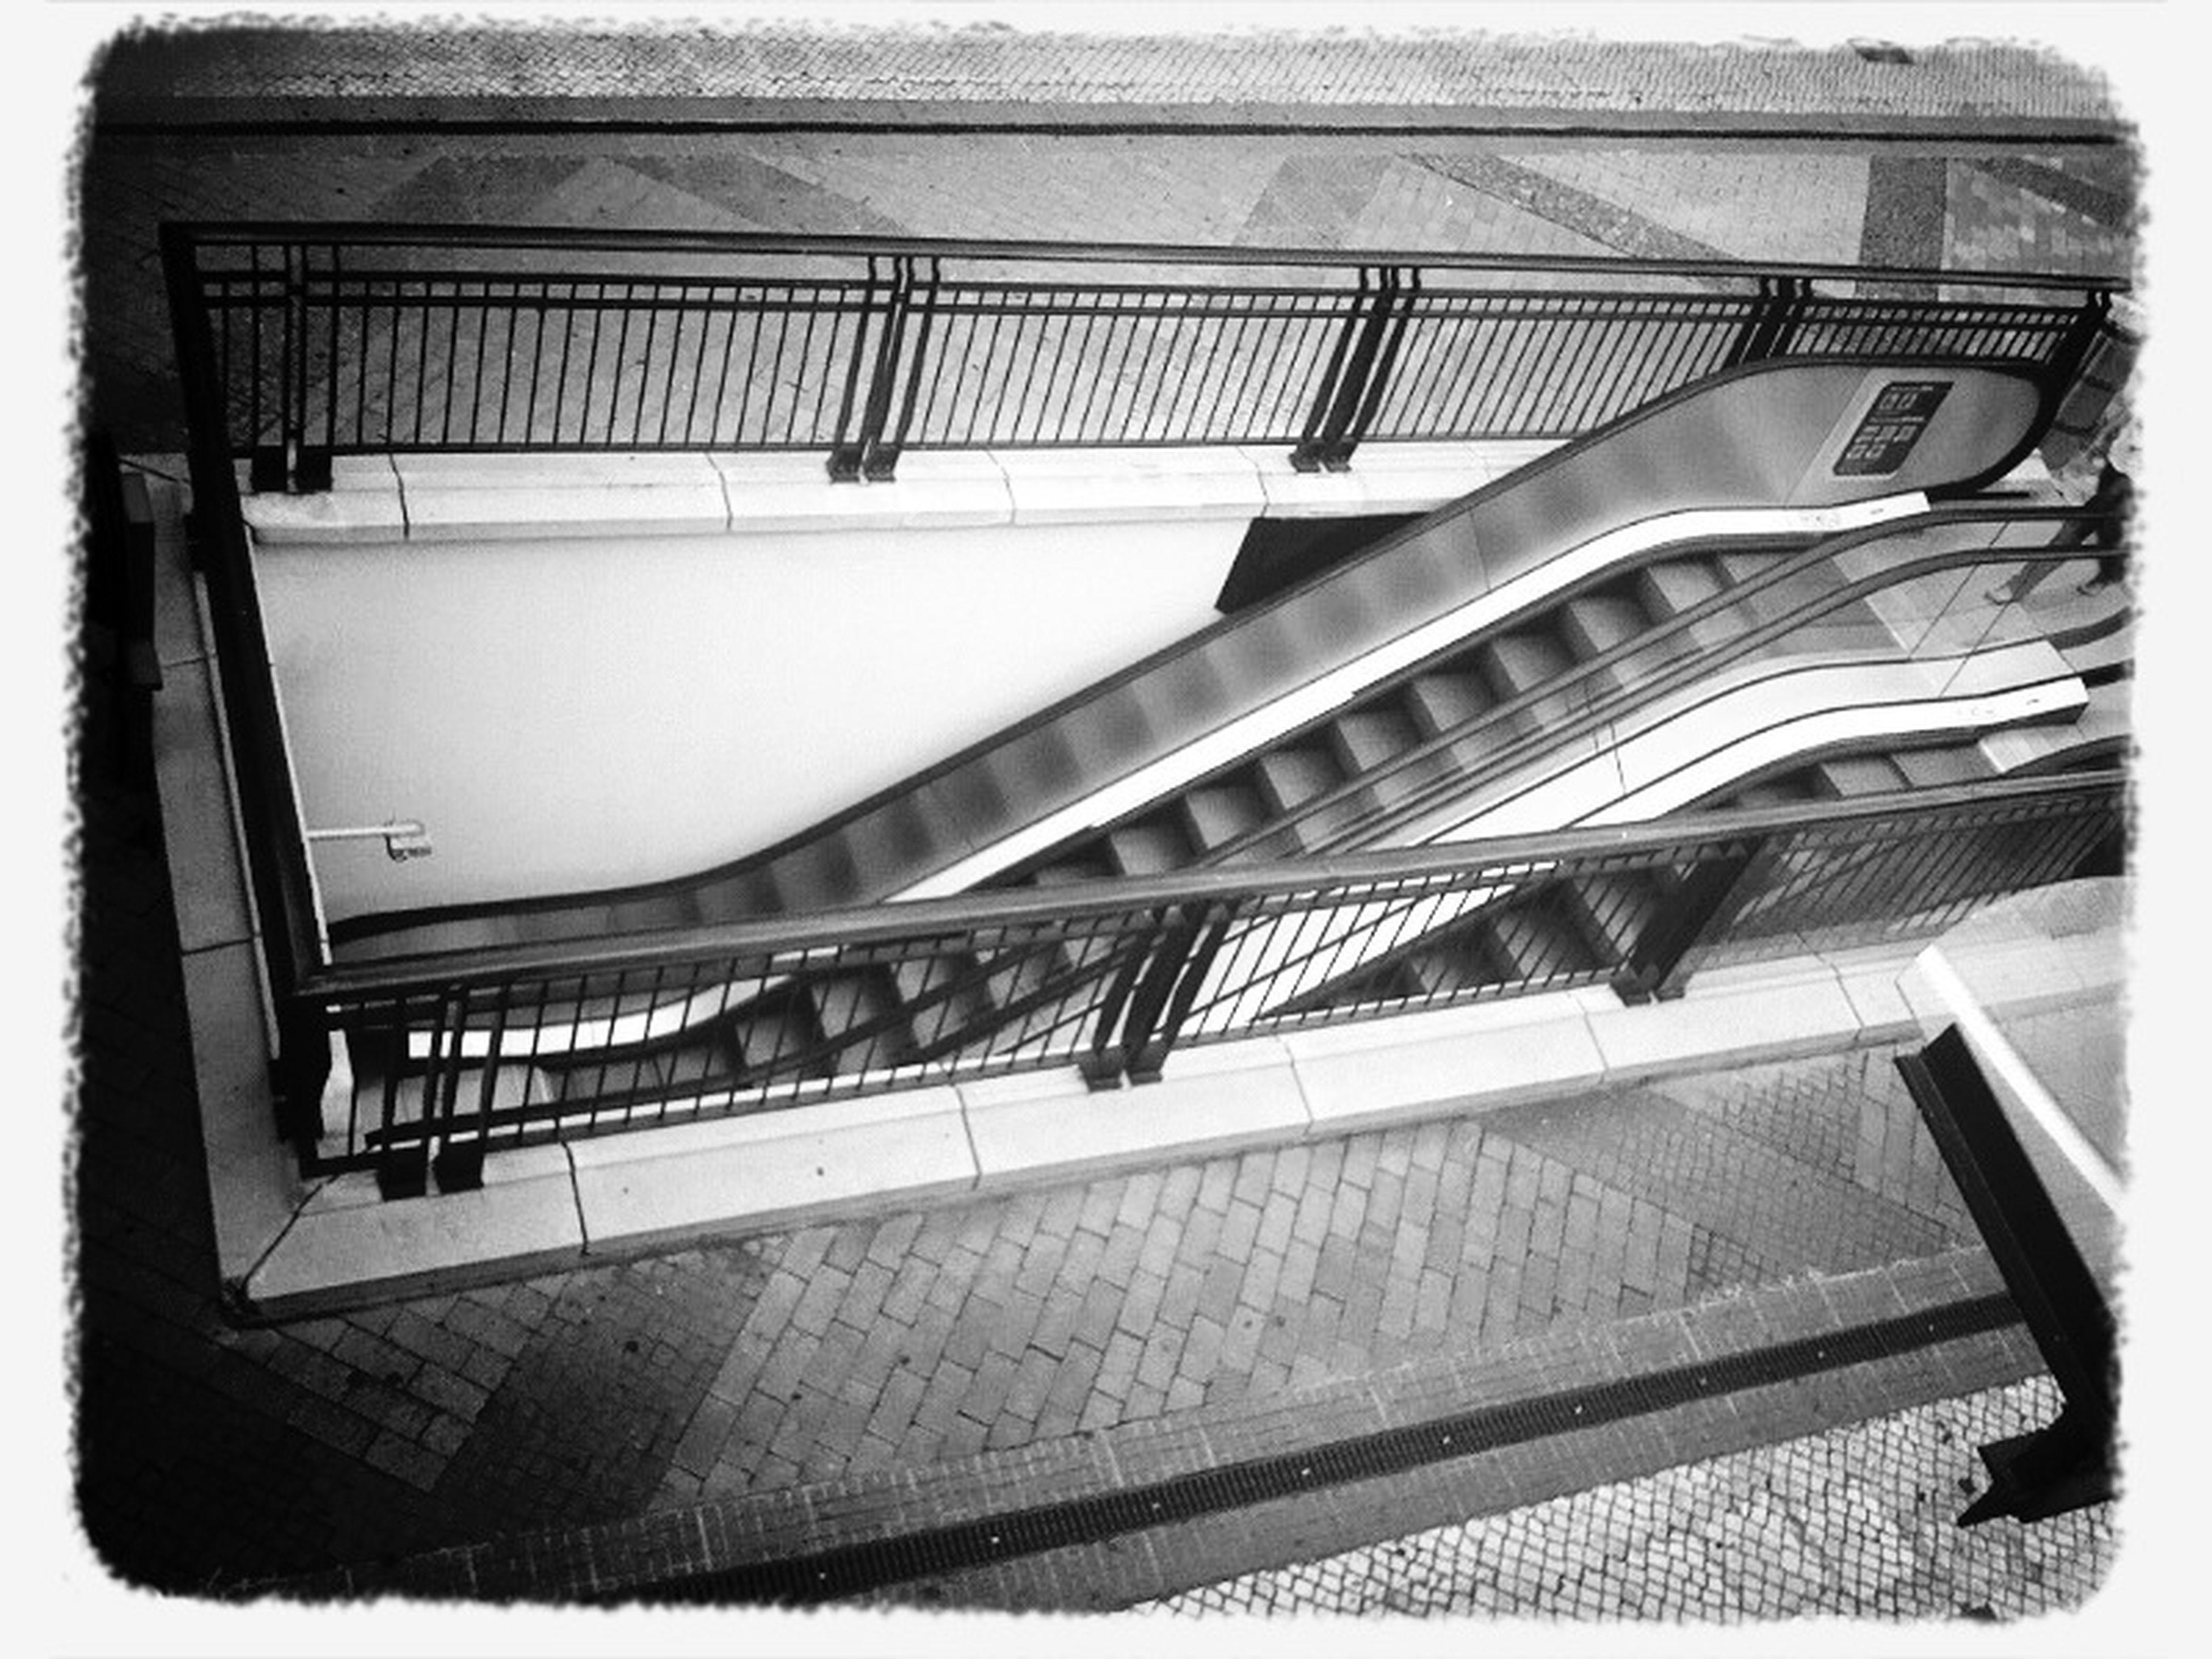 Aveiro Urban Geometry Hanging Out Stairs